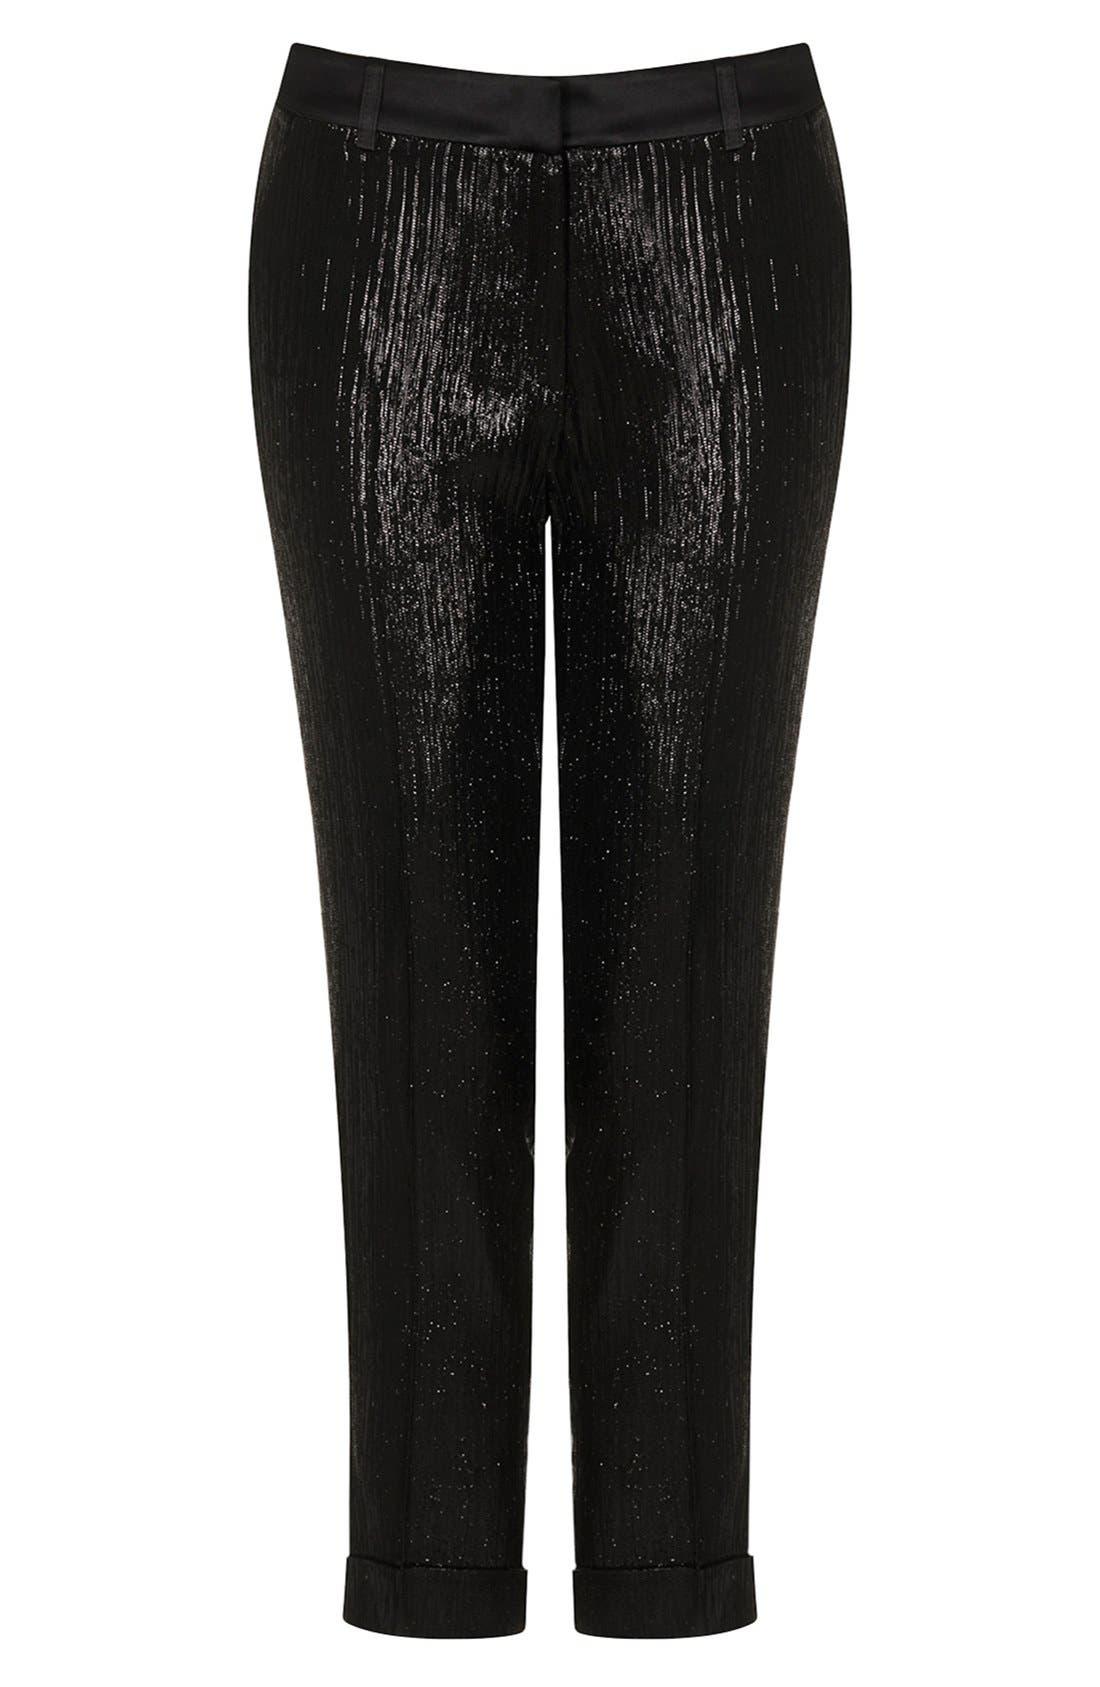 Alternate Image 3  - Kate Moss for Topshop Lamé Tuxedo Pants